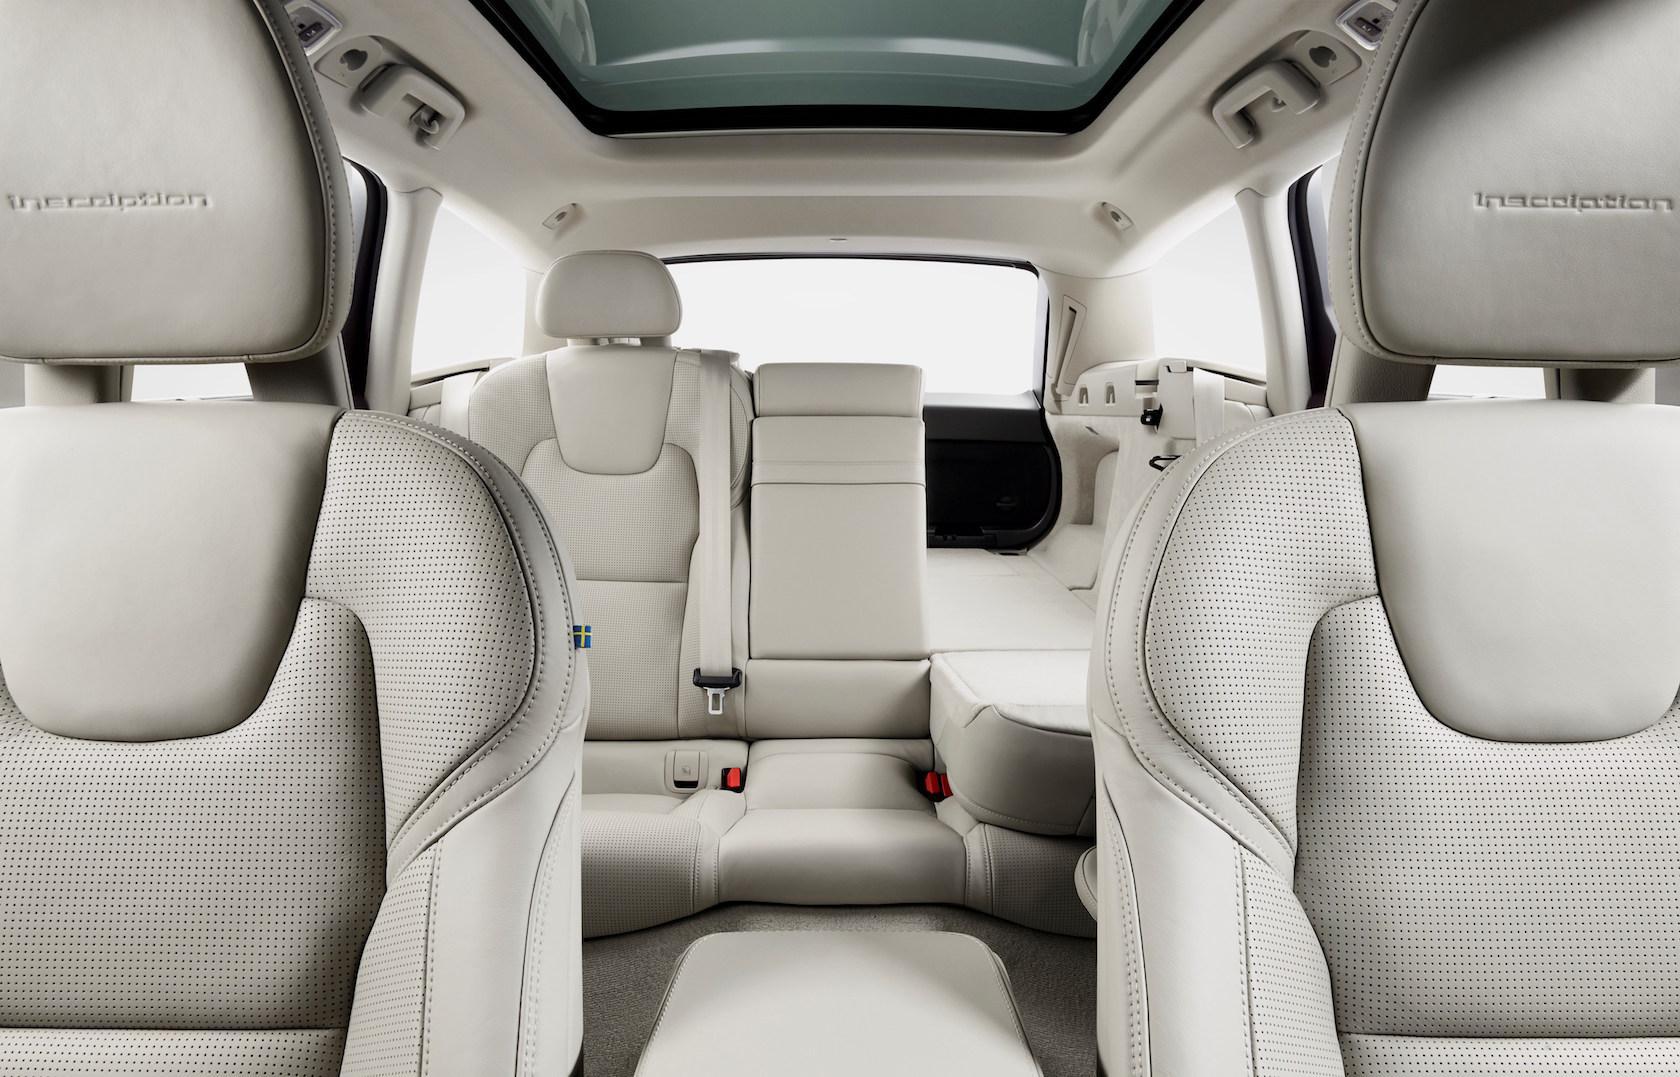 Volvo V90 Studio Folding Rear seats